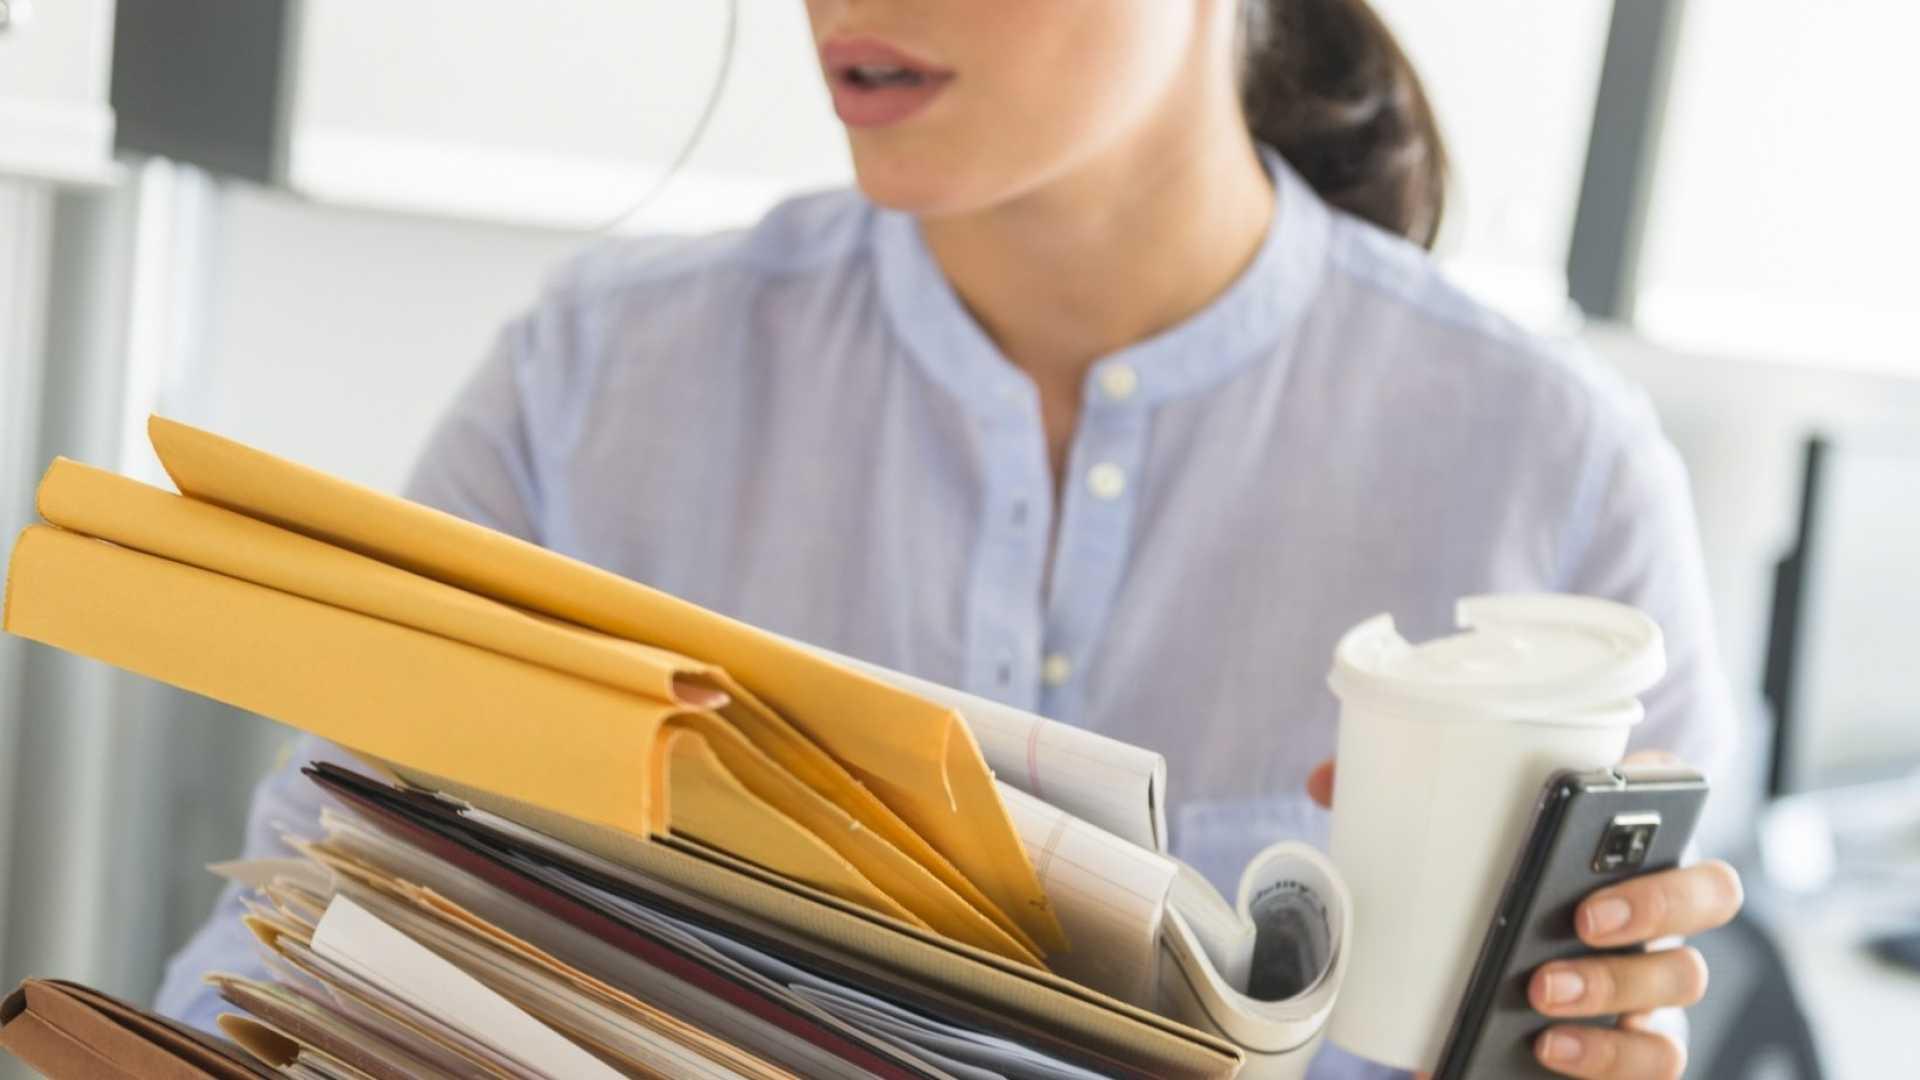 3 Ways to Get Rid of Stress at Work